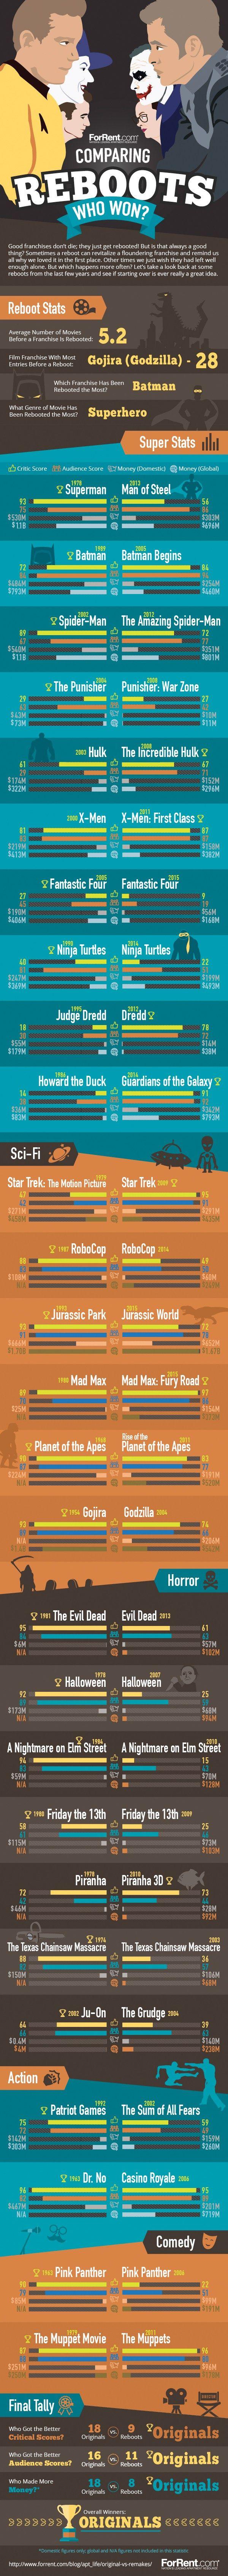 reboots-infographic